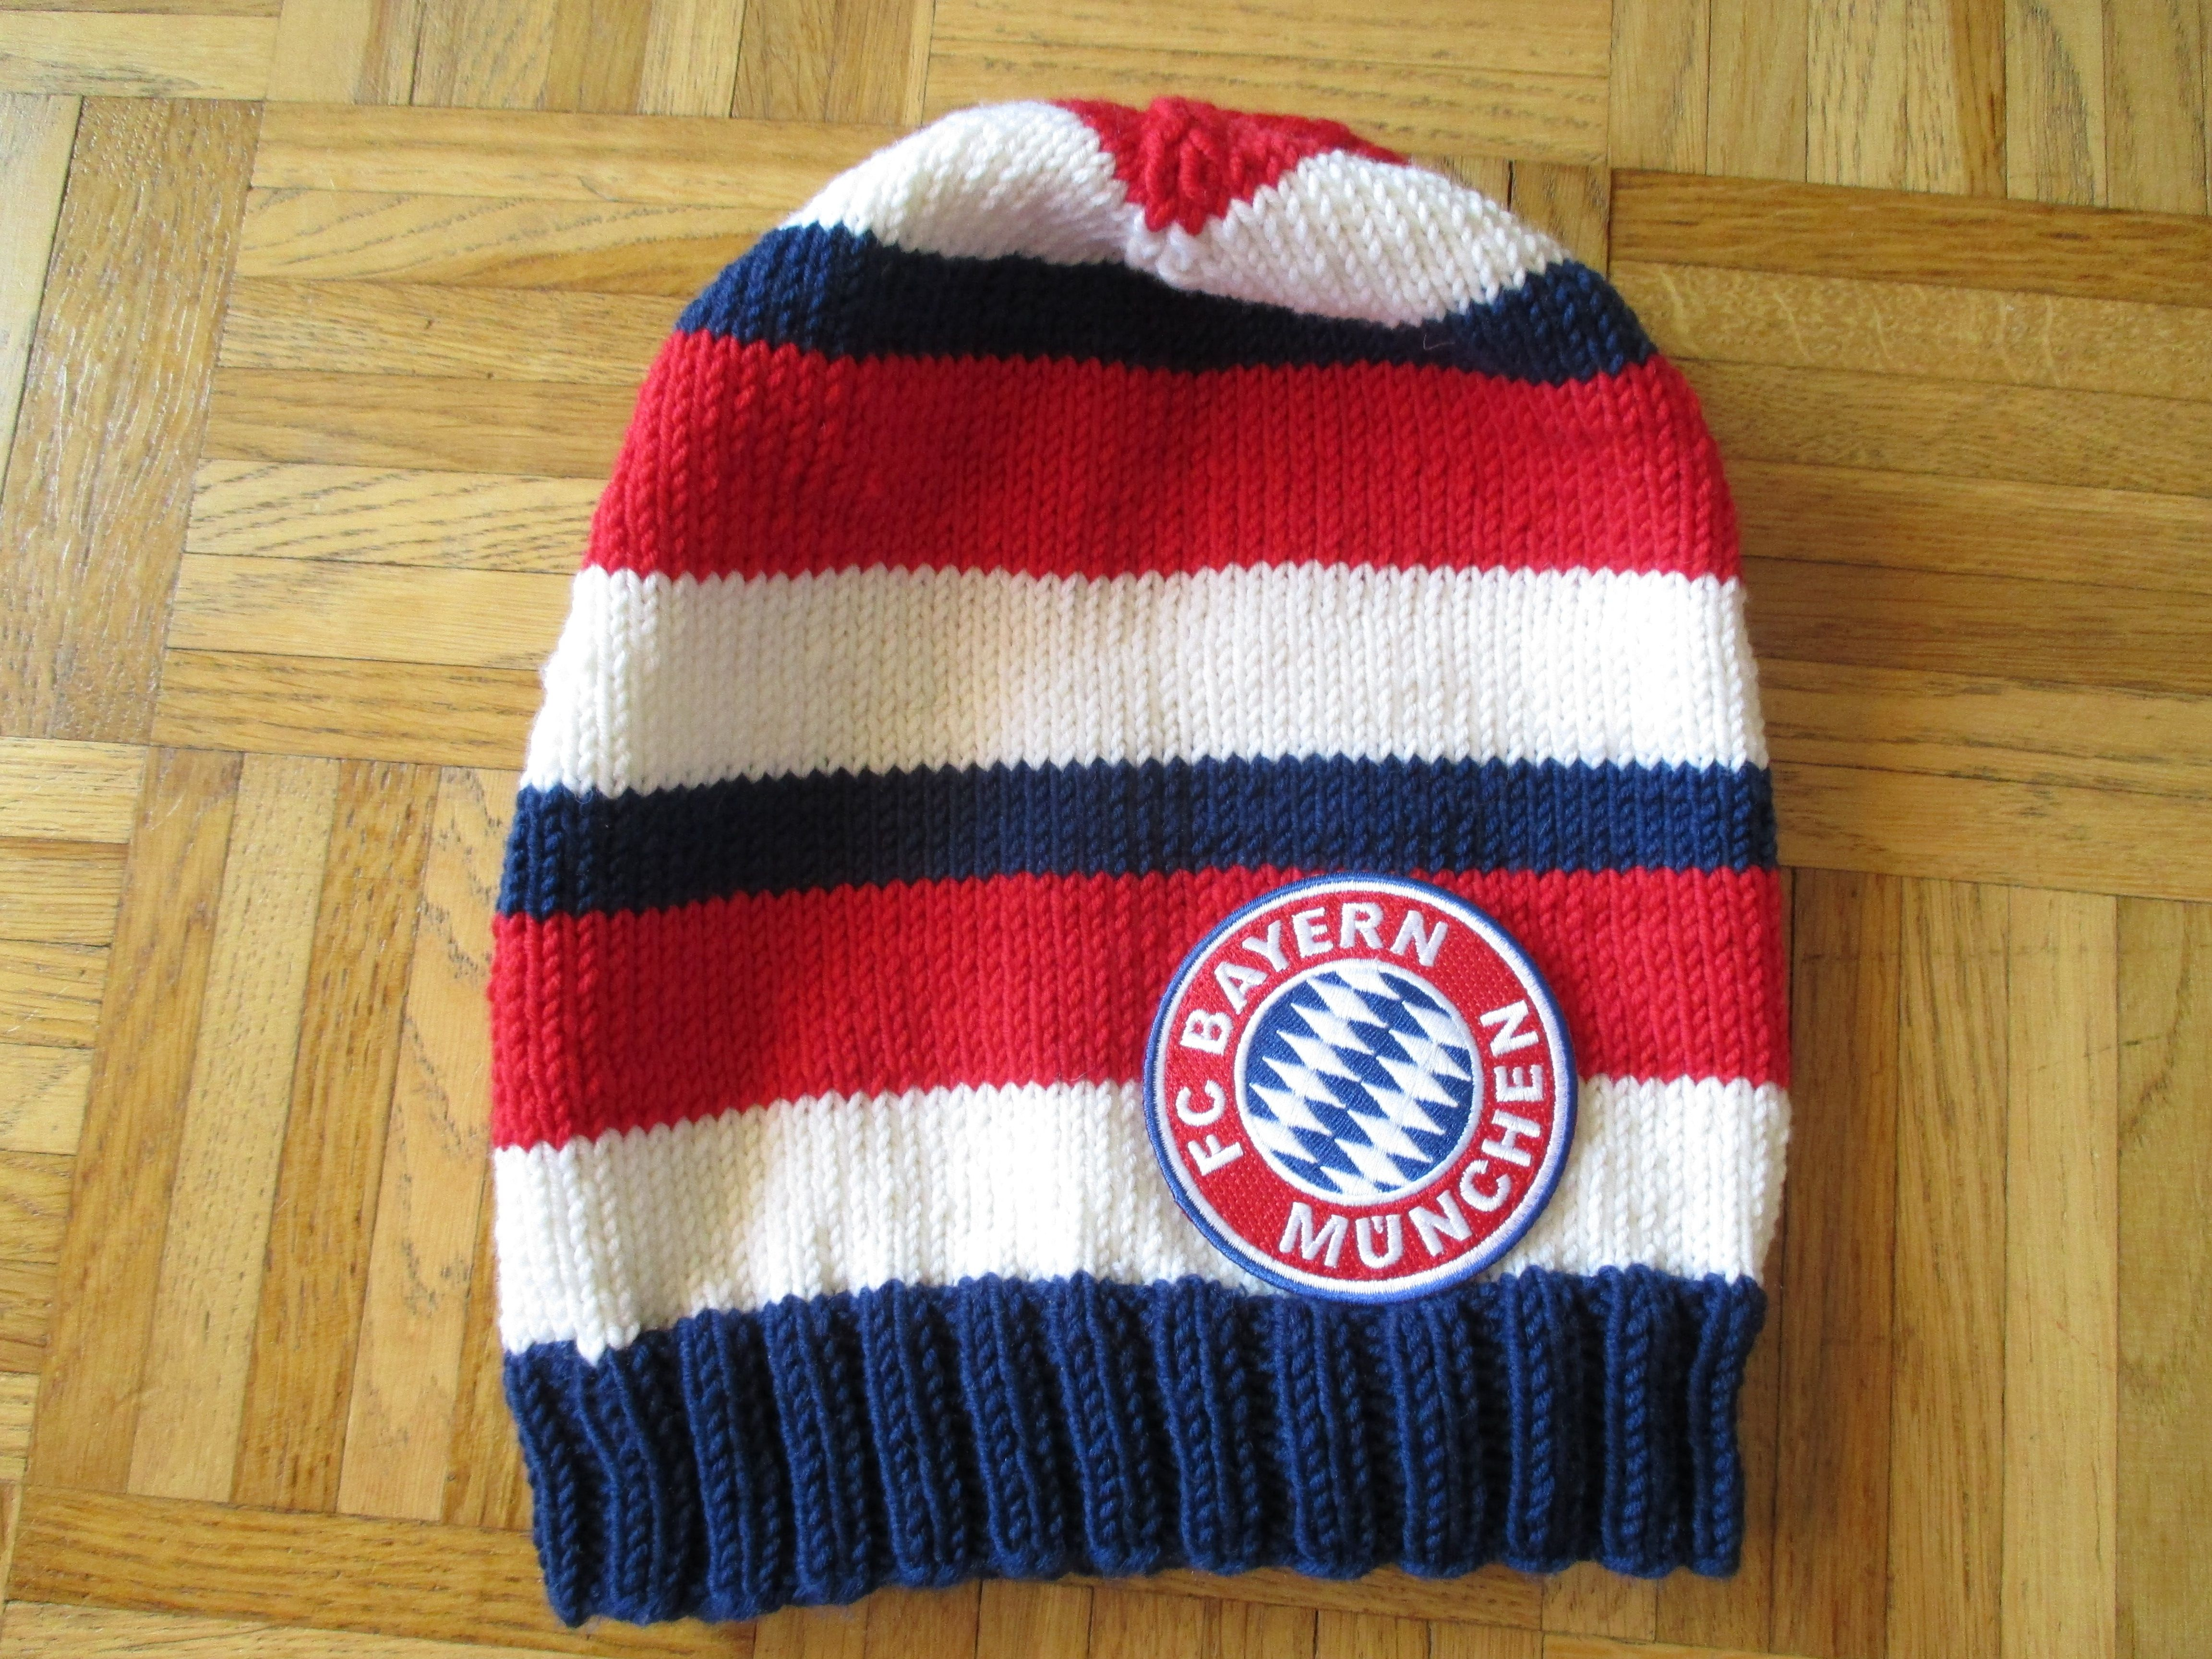 Knitting Fan Beanie Fc Bayern Munich Häkeln Pinterest Knitting